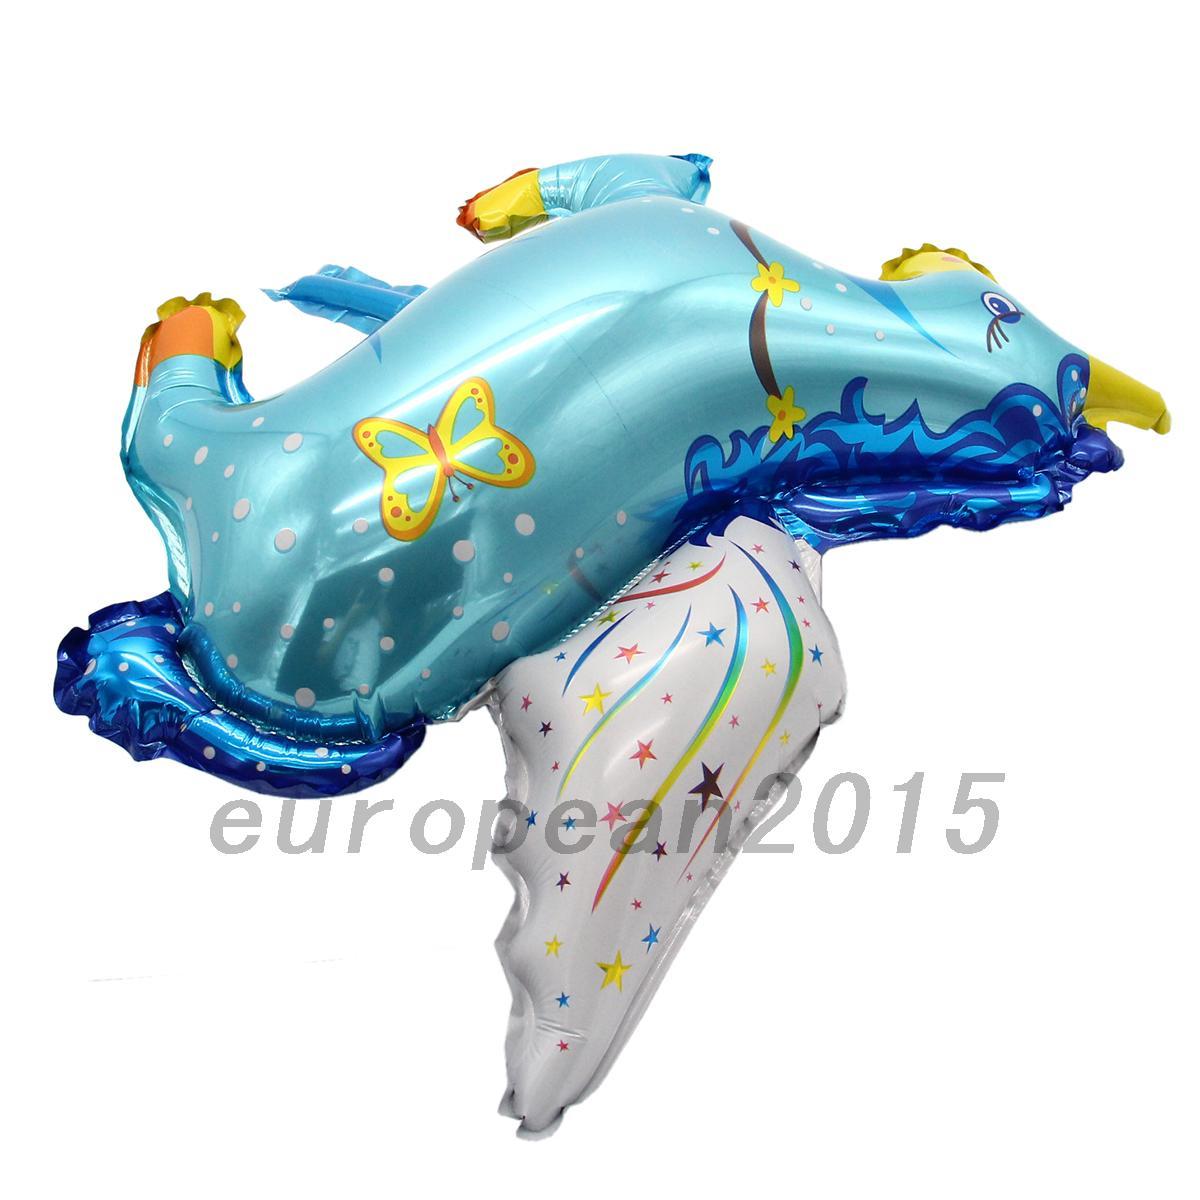 Unicorn Toys For Kids : Hot sale pcs unicorn pegasus balloons for children toy